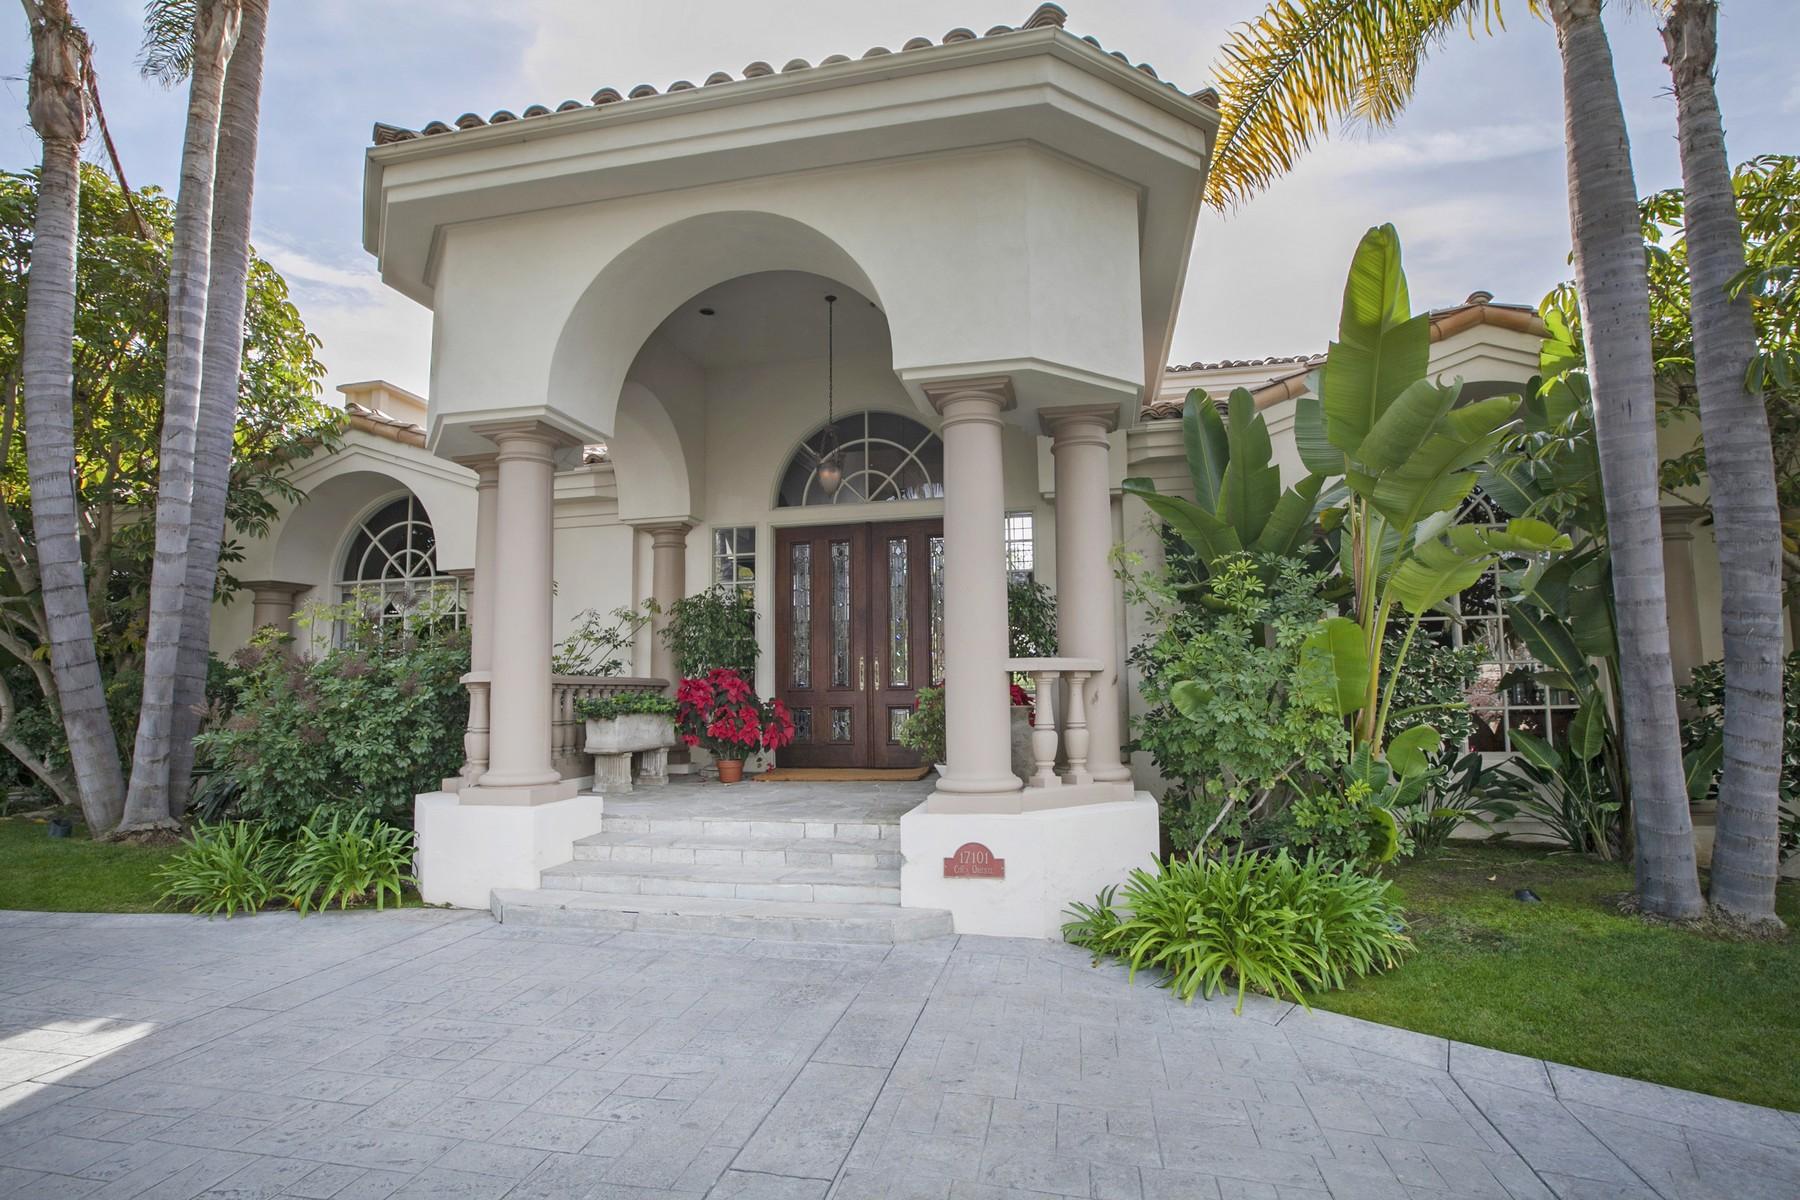 独户住宅 为 销售 在 17101 Circa Oriente Rancho Santa Fe, California 92067 United States